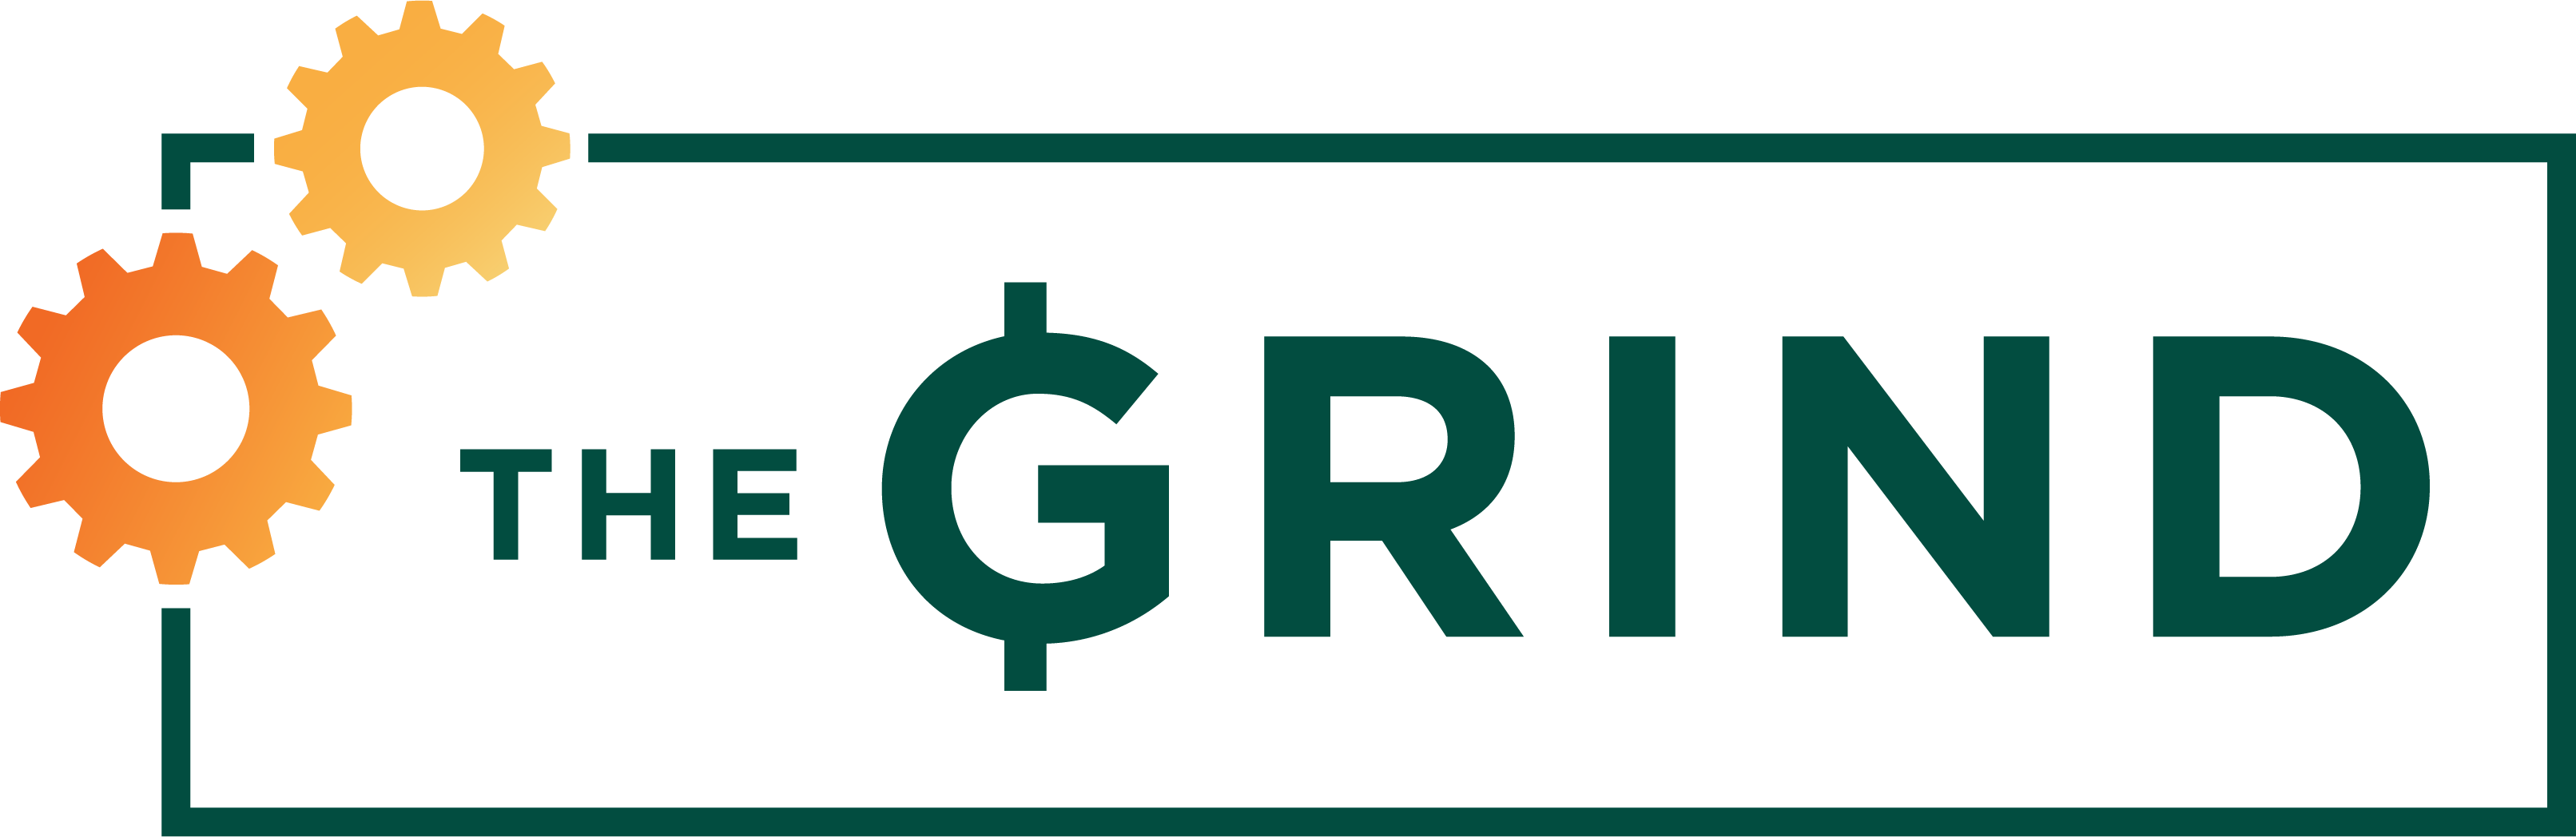 TheGrind Logo